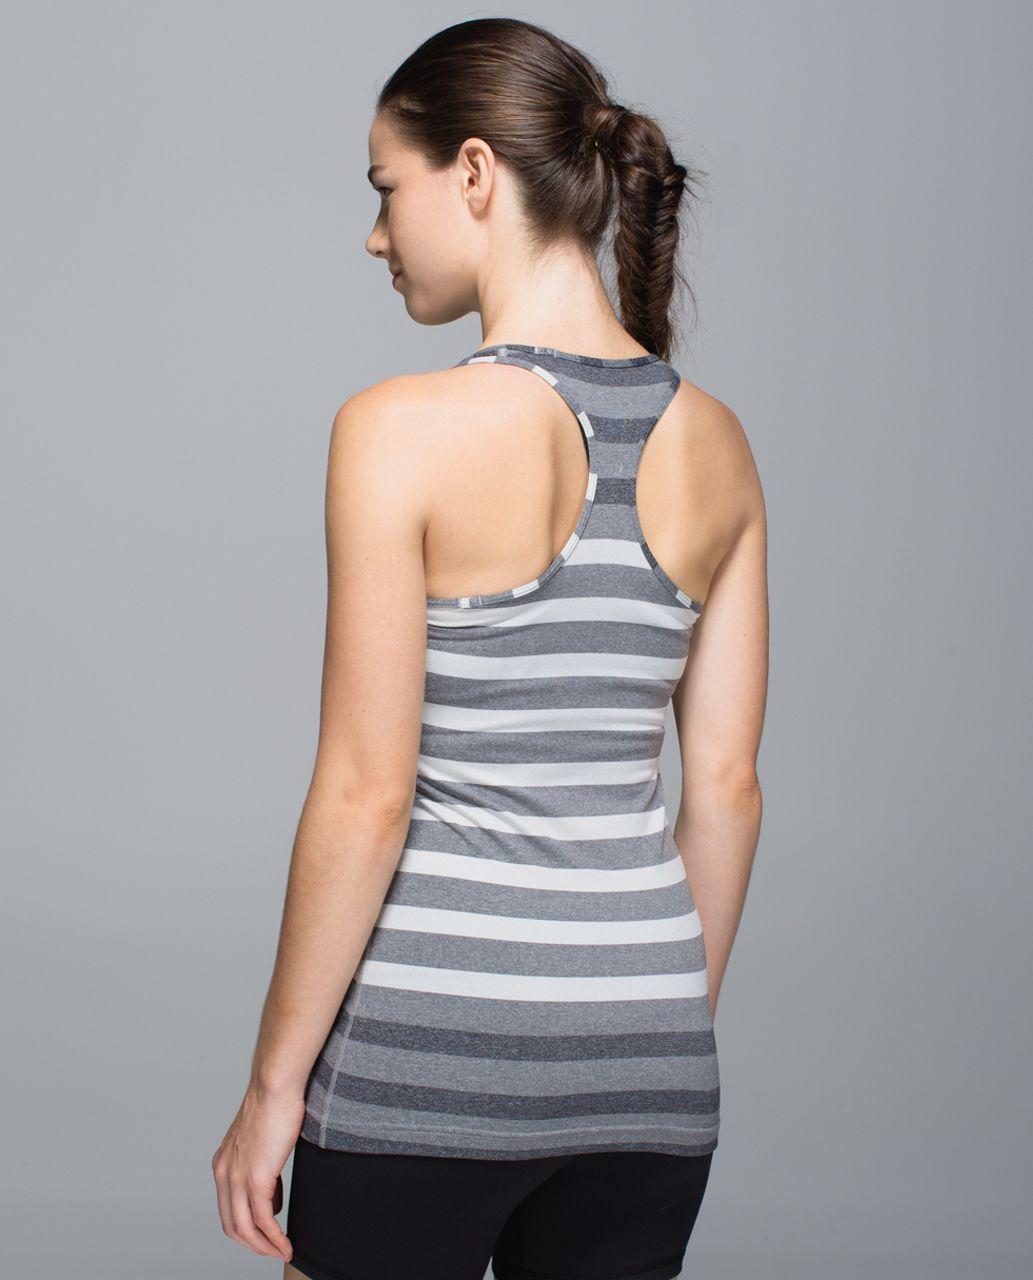 Lululemon Cool Racerback - Marshmallow Stripe Heathered Sand Dune Black / Ghost